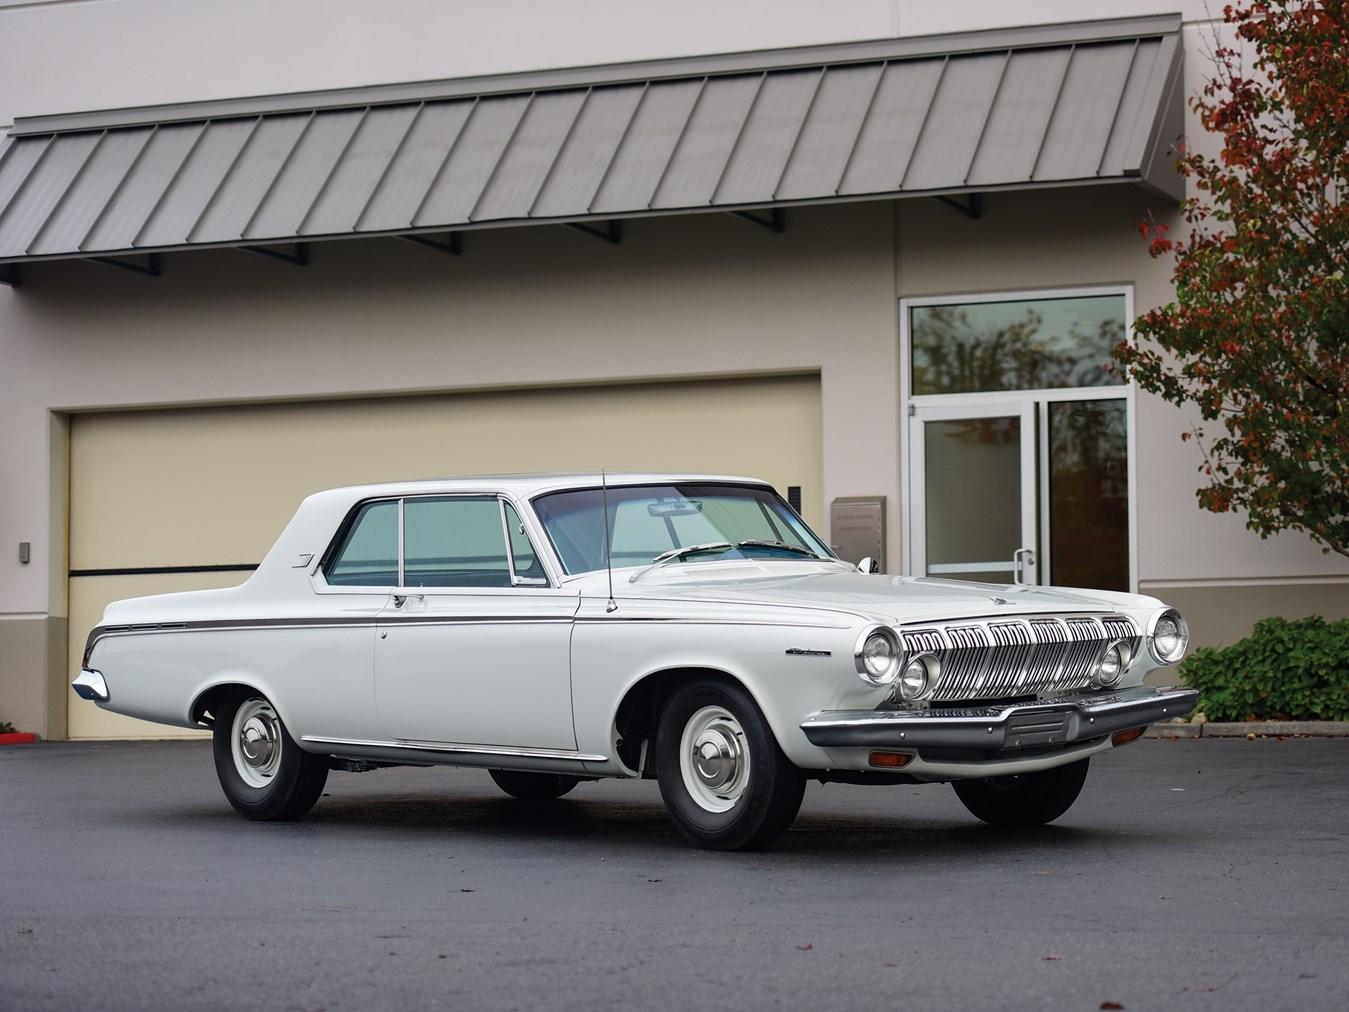 1963 dodge polara max wedge 383 auction